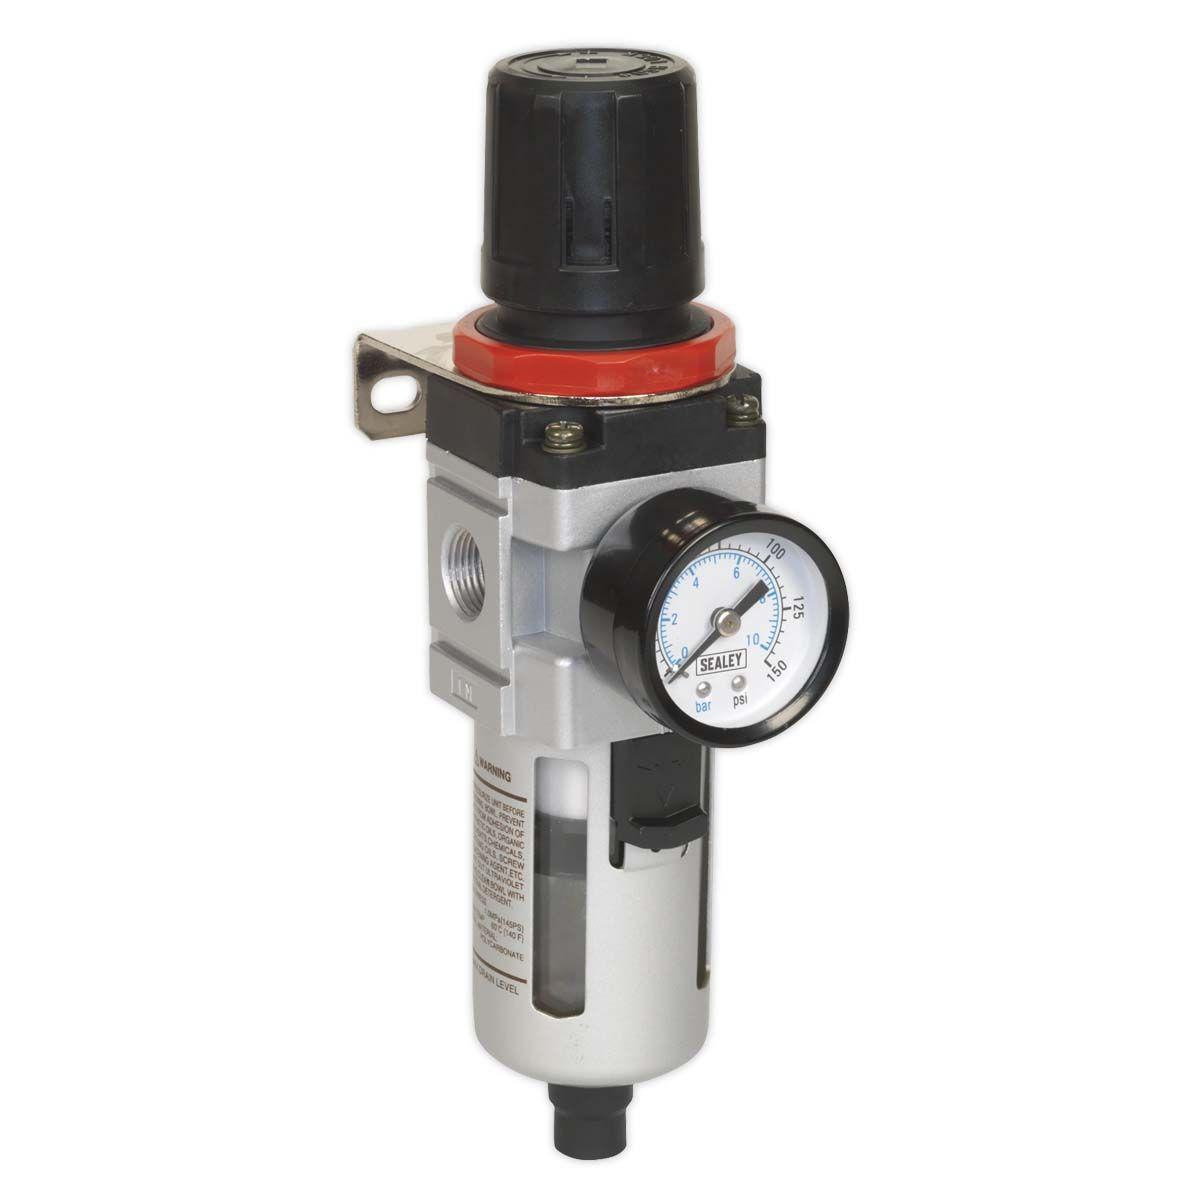 Sealey Air Filter/Regulator with Gauge